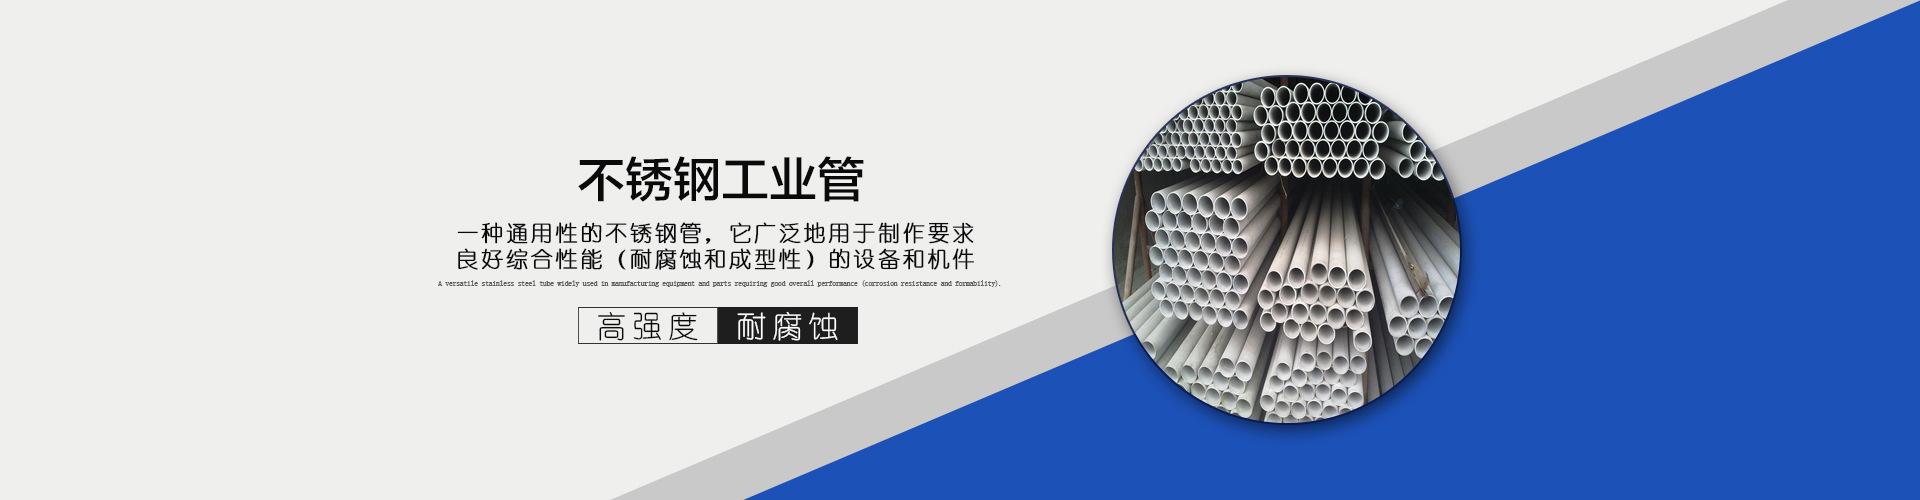 <h4>不锈钢工业管</h4><p>耐腐蚀、耐高温、含氮高强度高 </p>